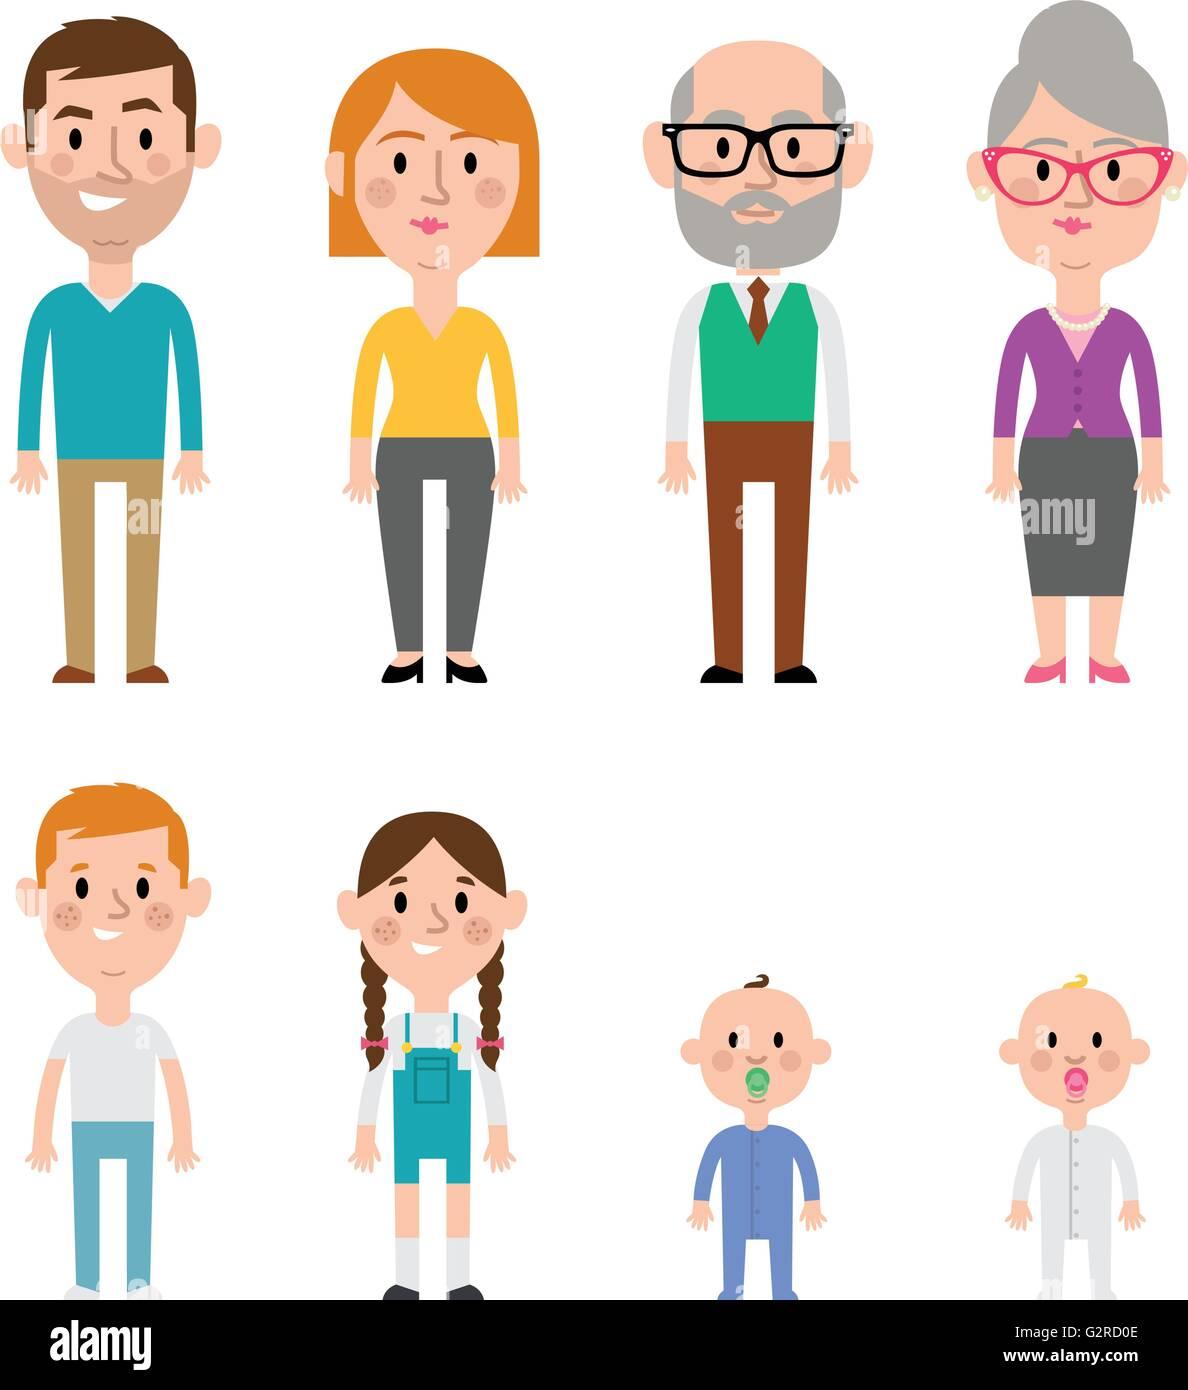 Flat Vector Caucasian Family Members. Parents, Grandparents, Children and Baby - Stock Image